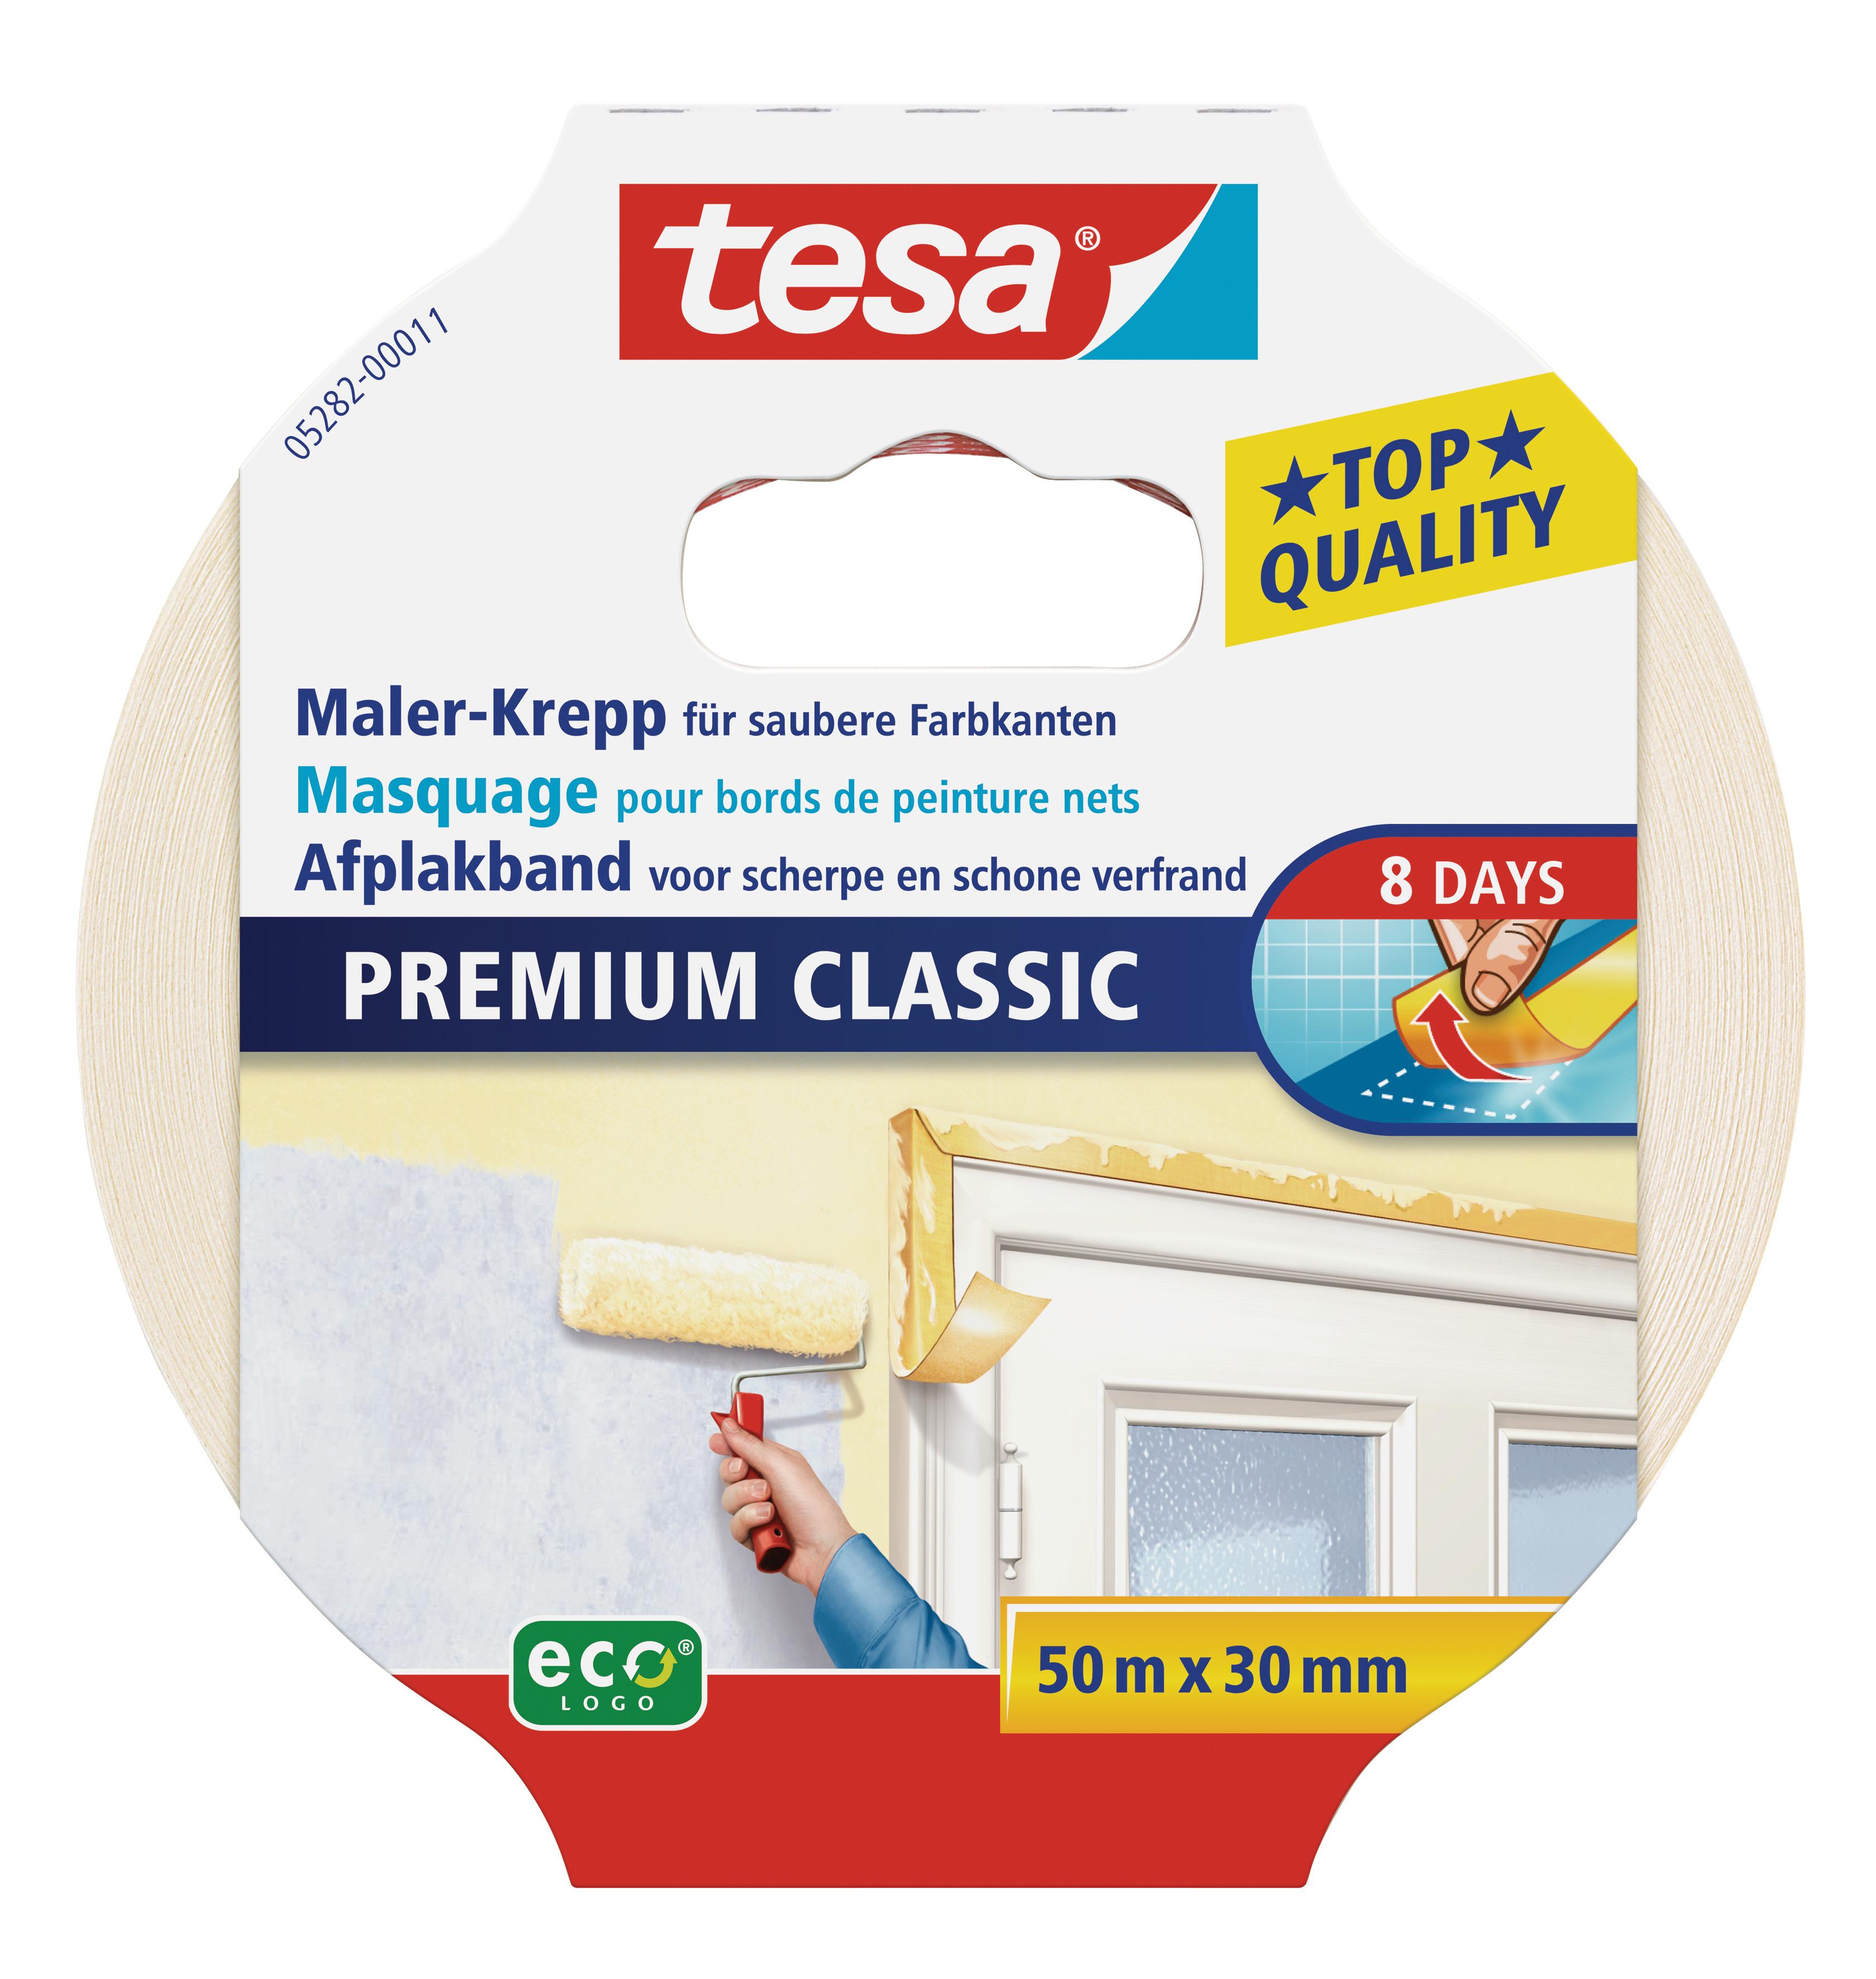 GP: 0,07 EUR/m tesa Maler-Krepp Premium Classic 50m x 30mm